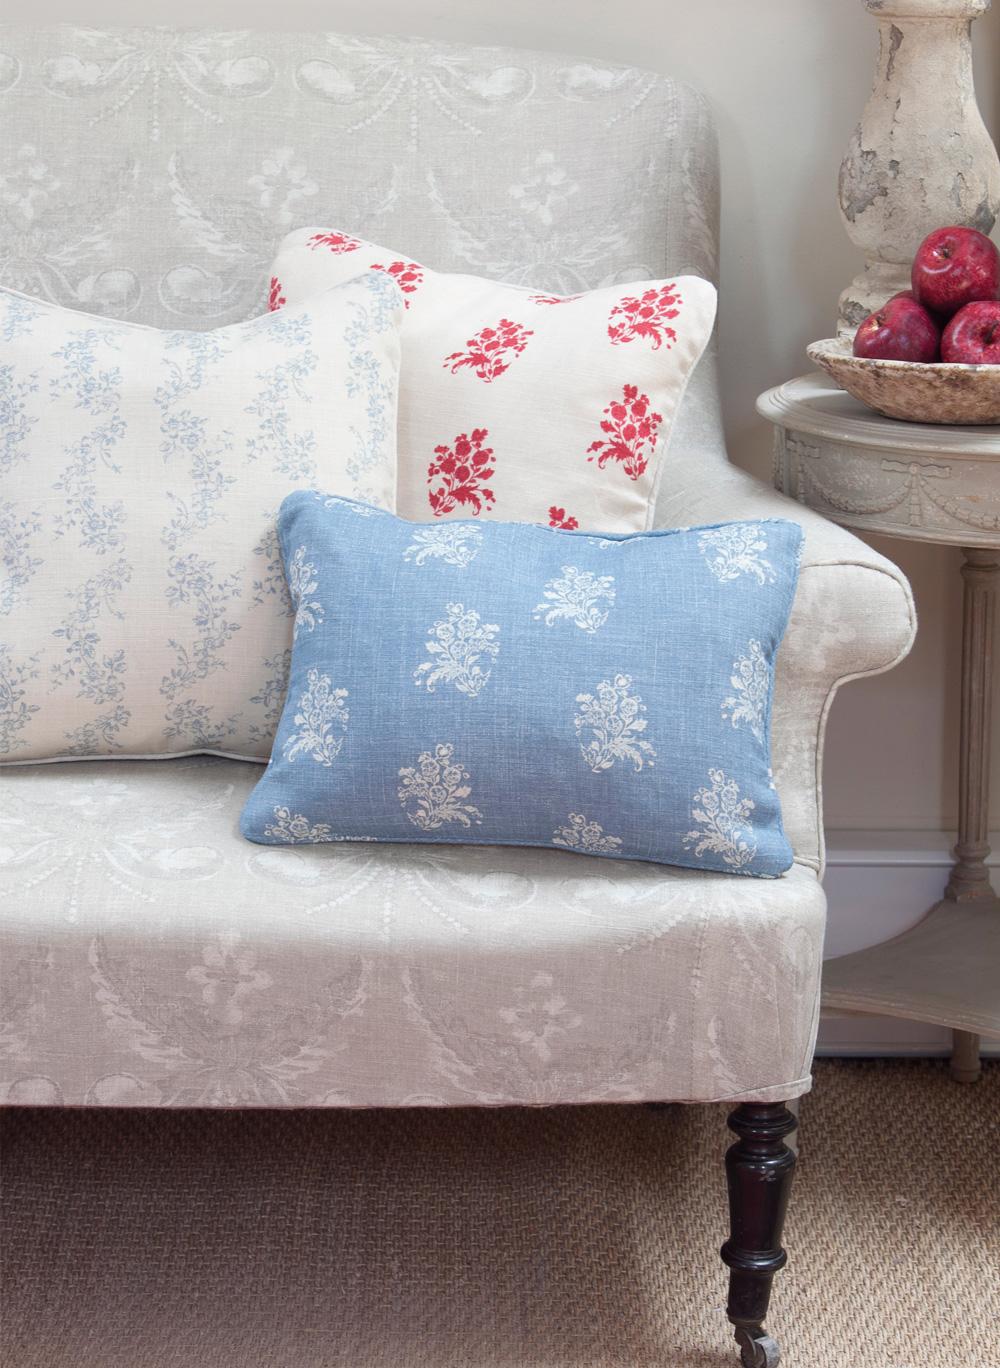 Stone-Josephine-Sofa-with-Cushions